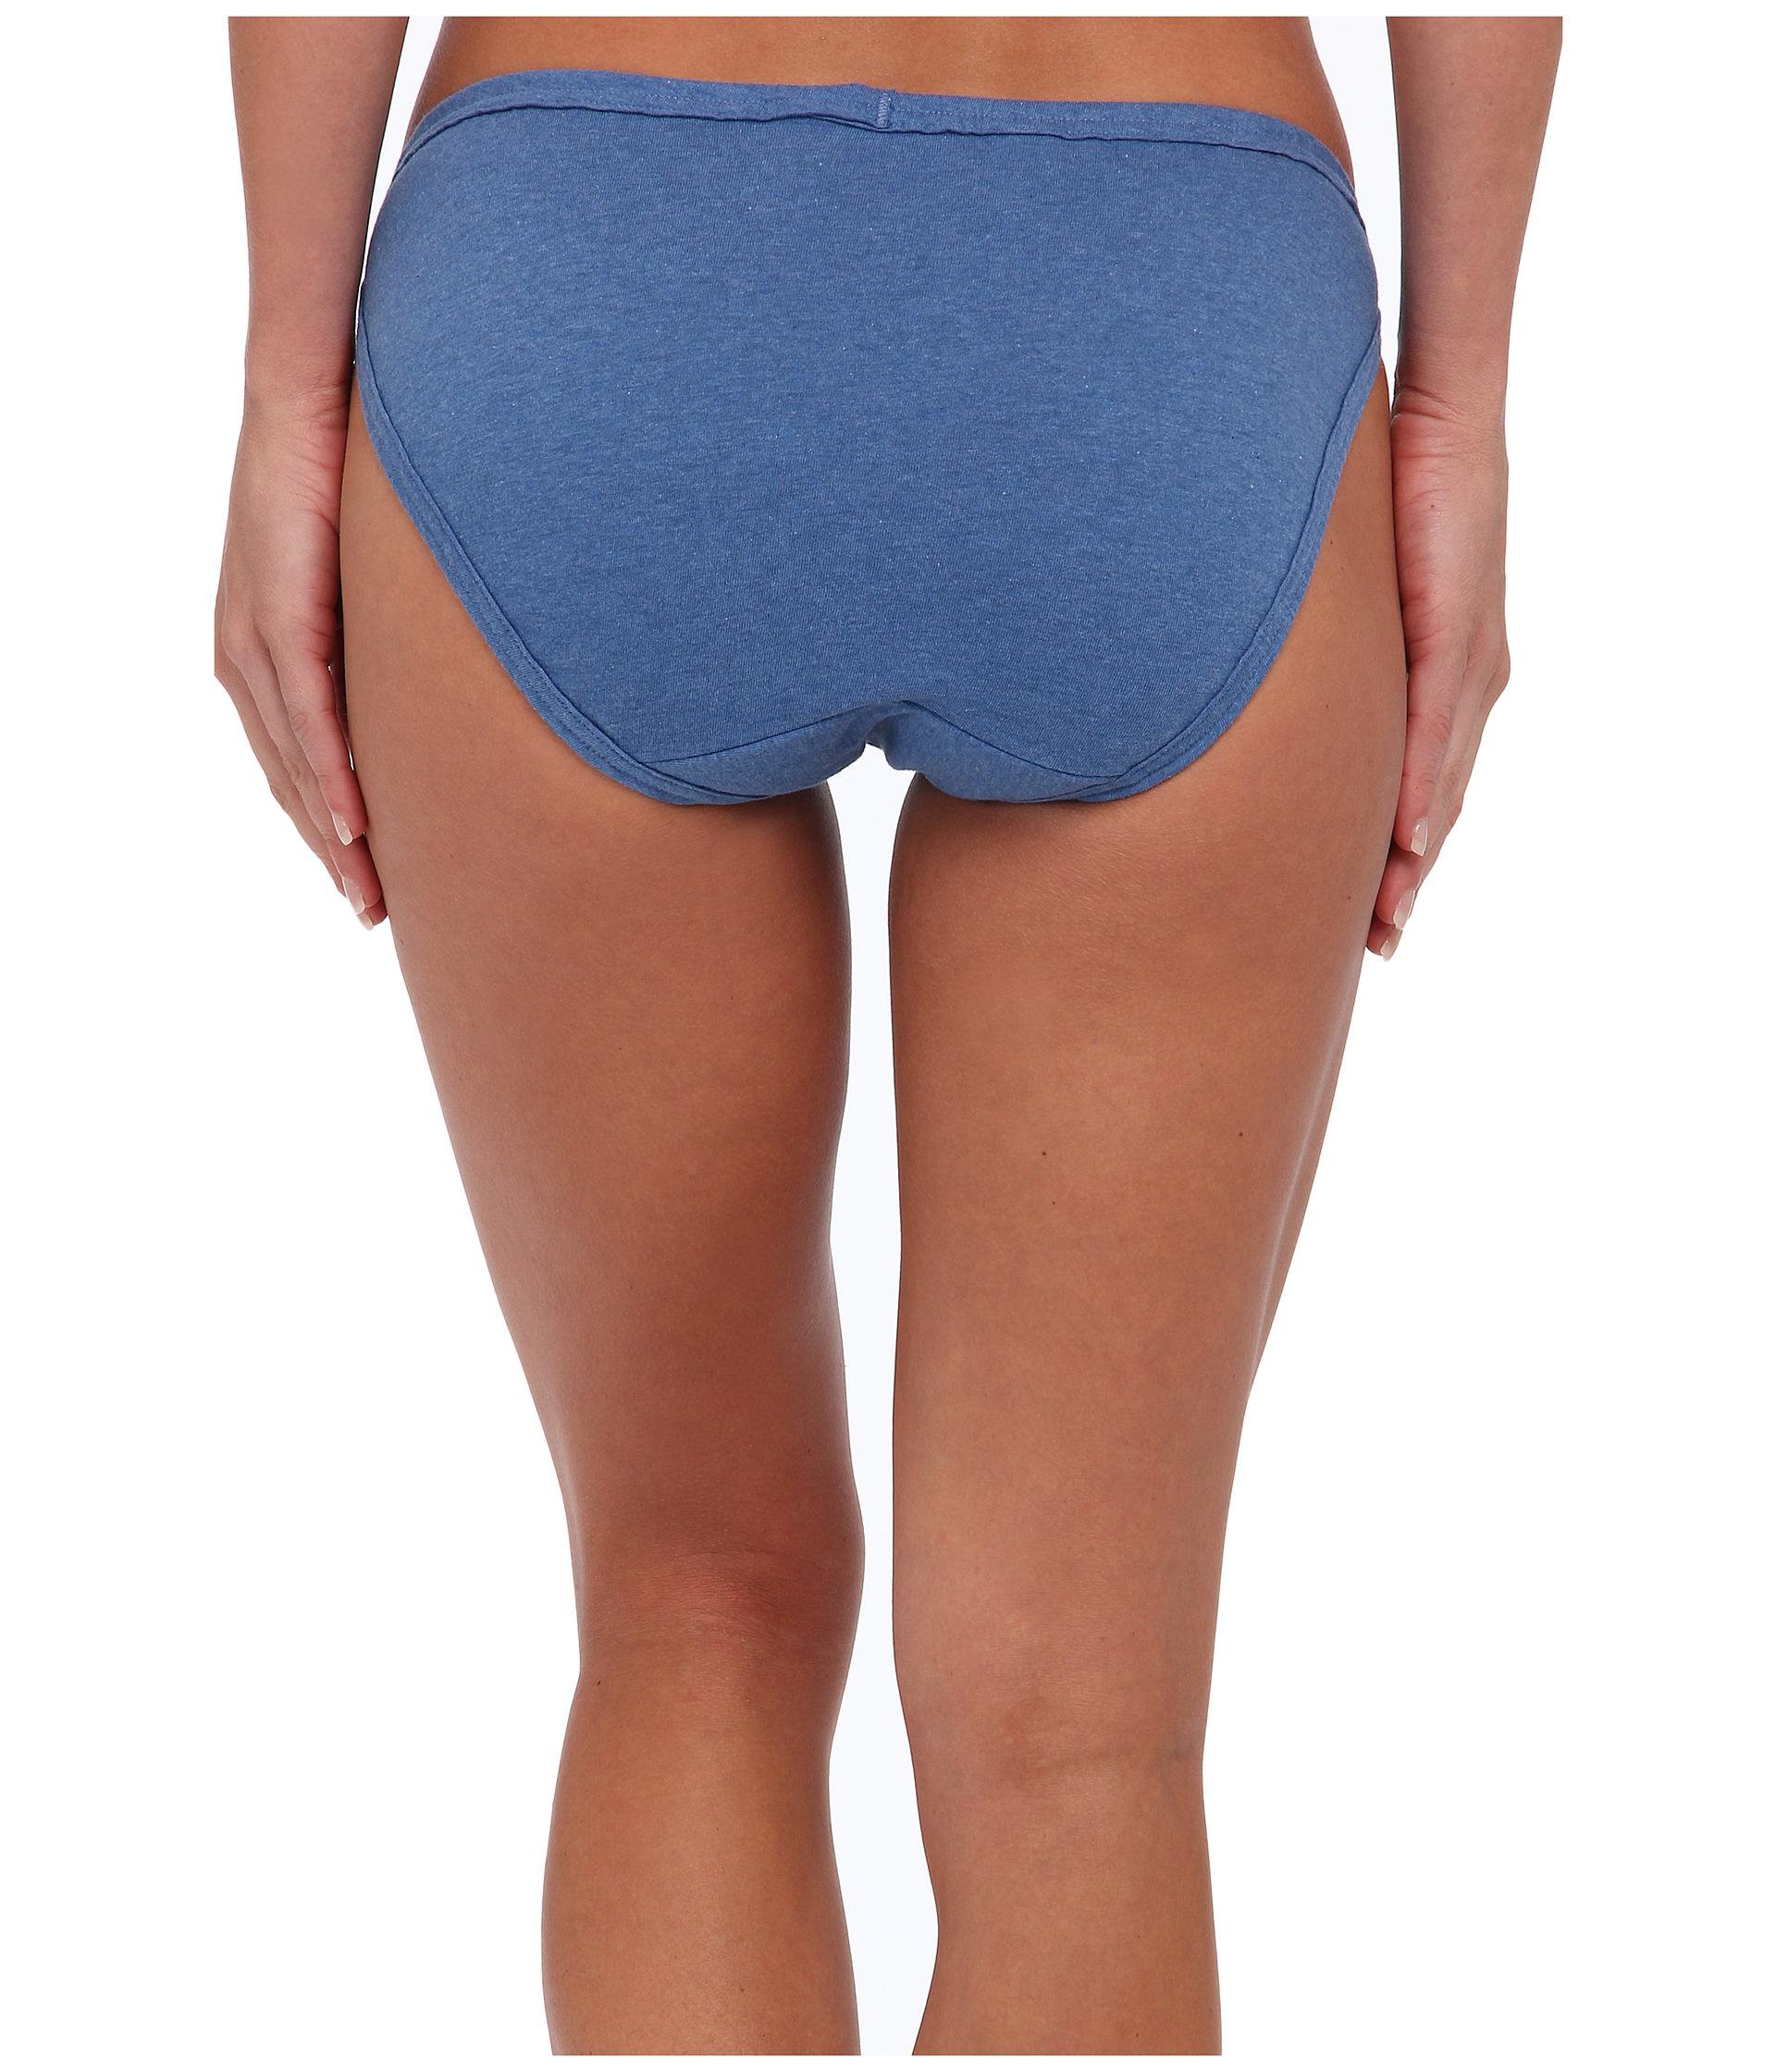 00728bee4 Jockey Elance® String Bikini 3 Pack Deep Blue Heather Deep Blue Dot Sea Blue  Denim Heather on PopScreen